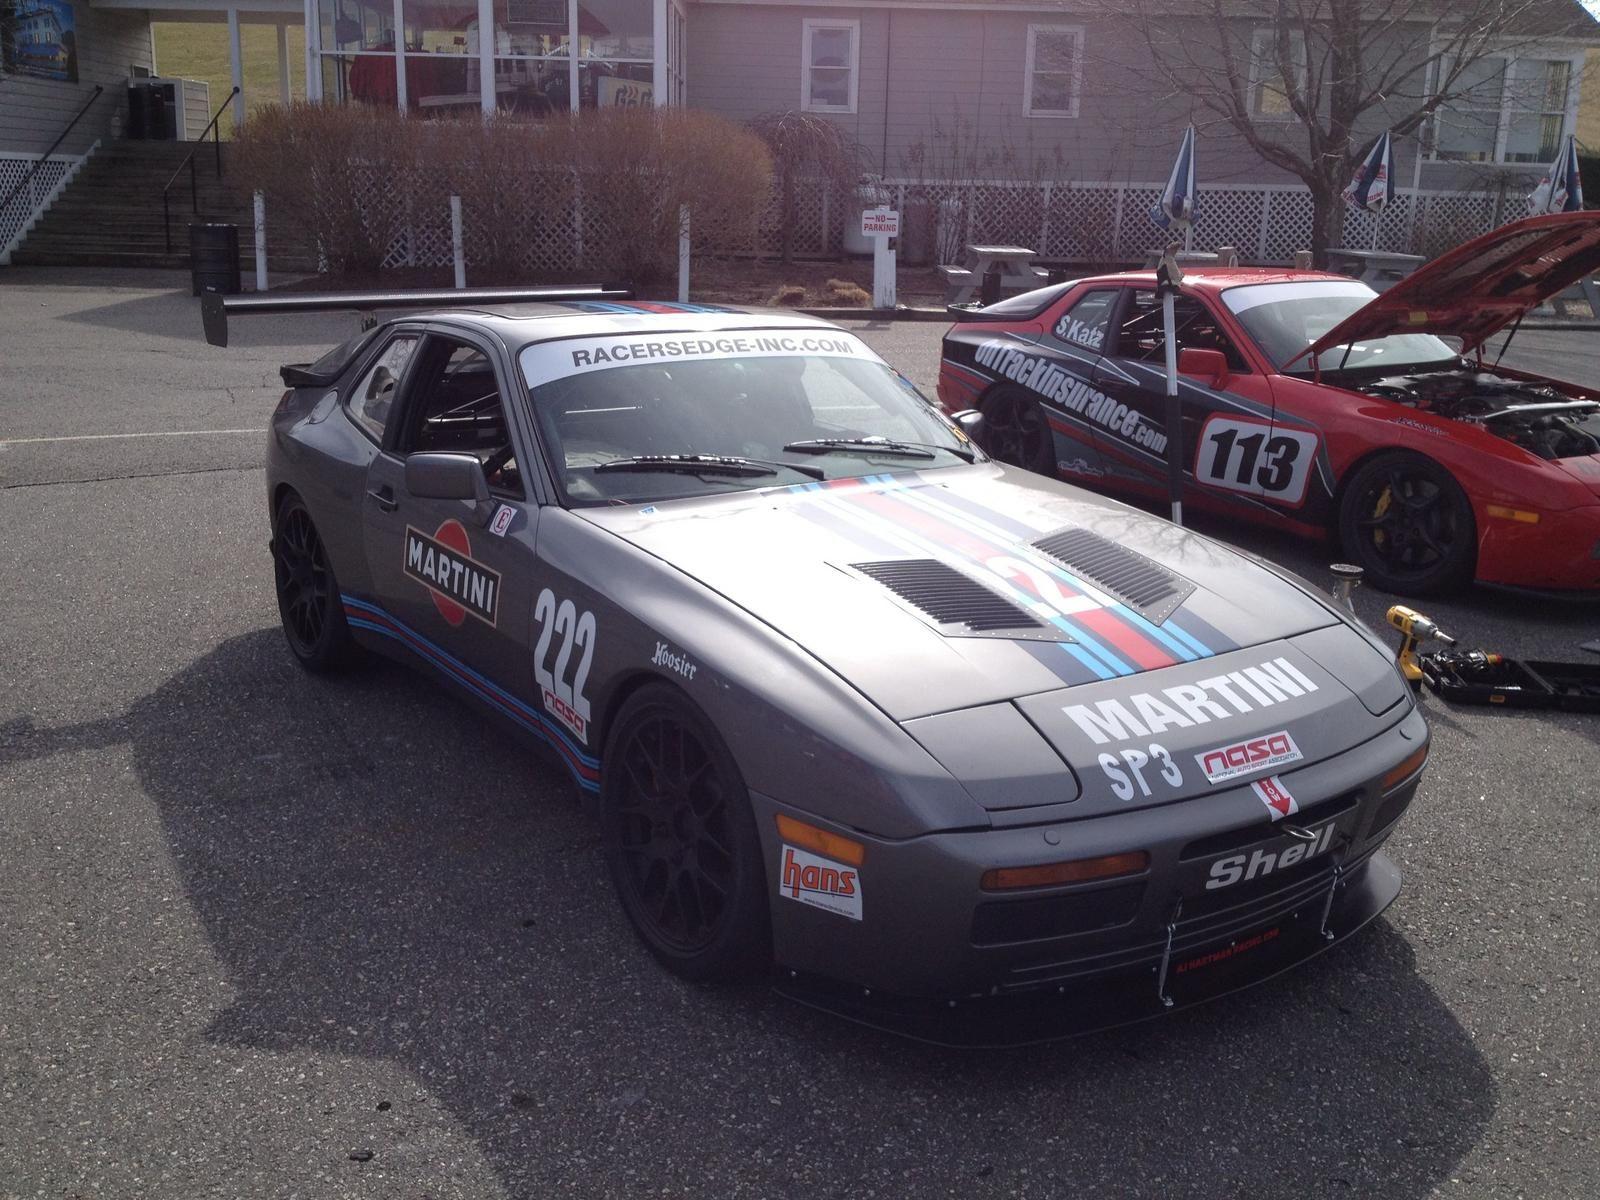 87 Porsche 944 Turbo Track Car - Rennlist Discussion Forums ...